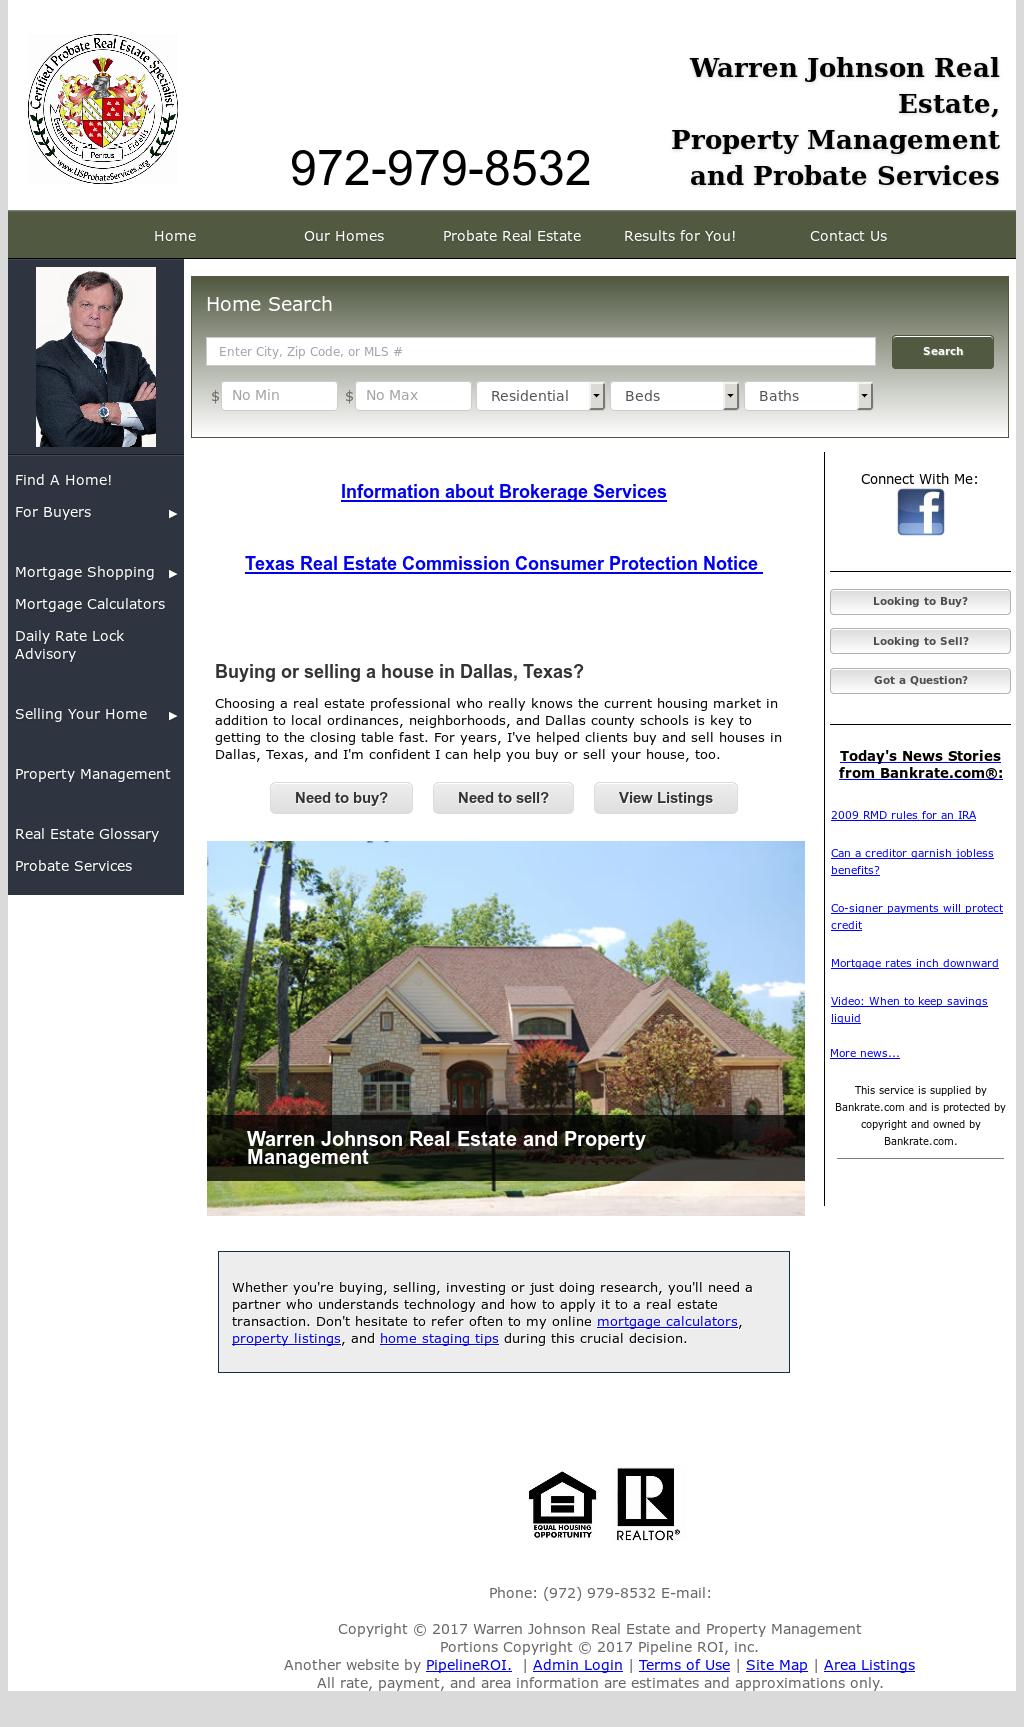 Warren Johnson Real Estate & Property Management Competitors